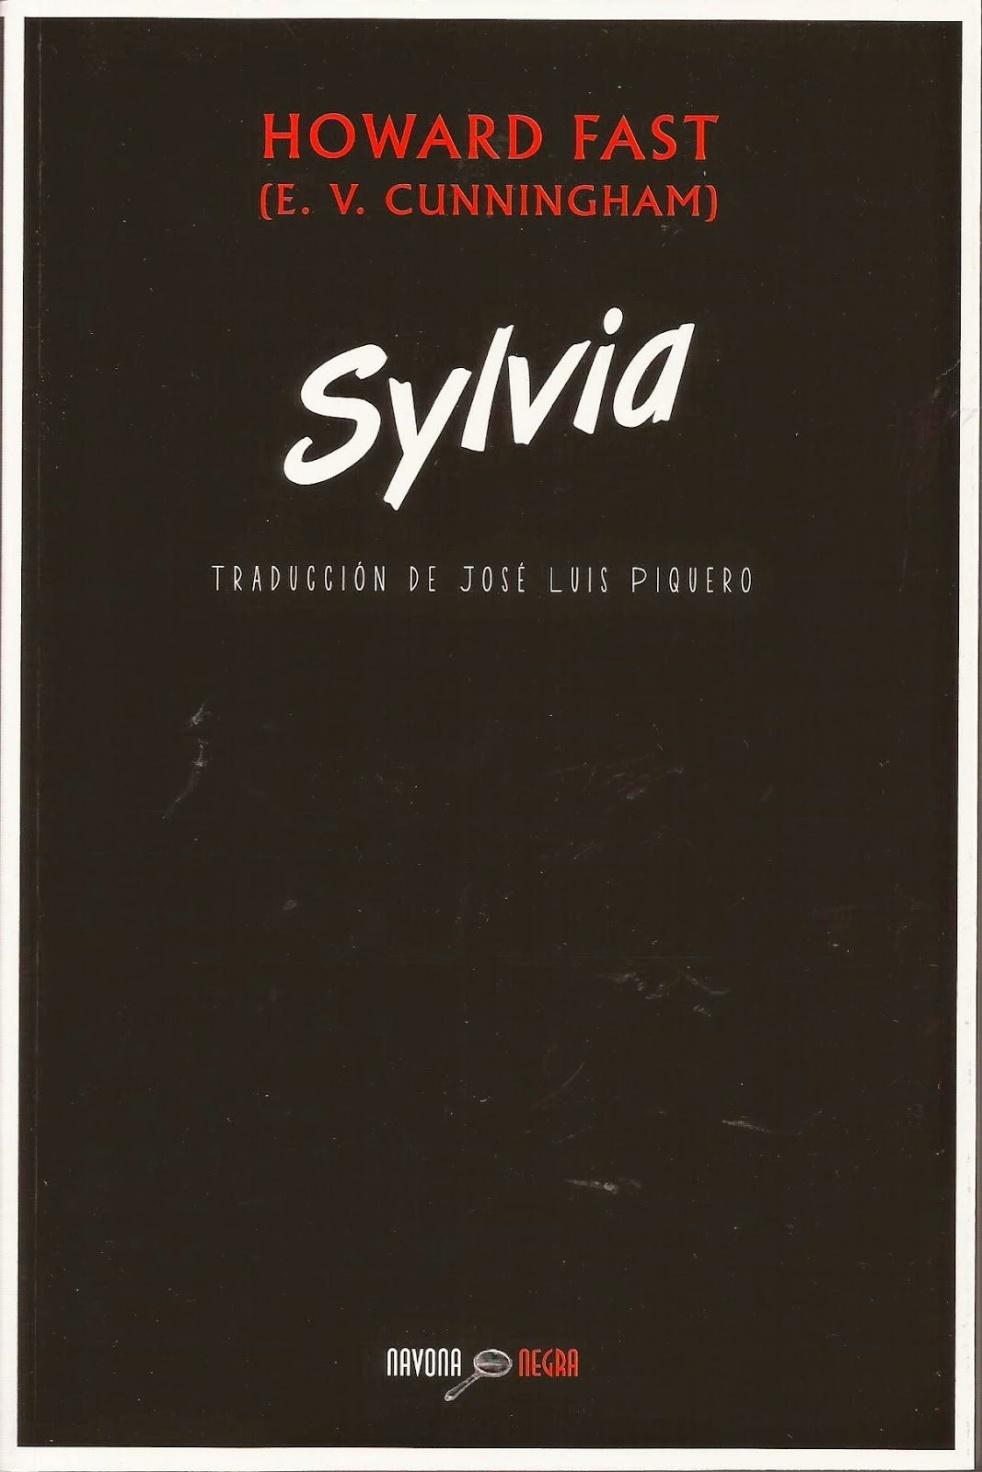 sylvia-howard-fast-cunningham-paginas-de-nieve